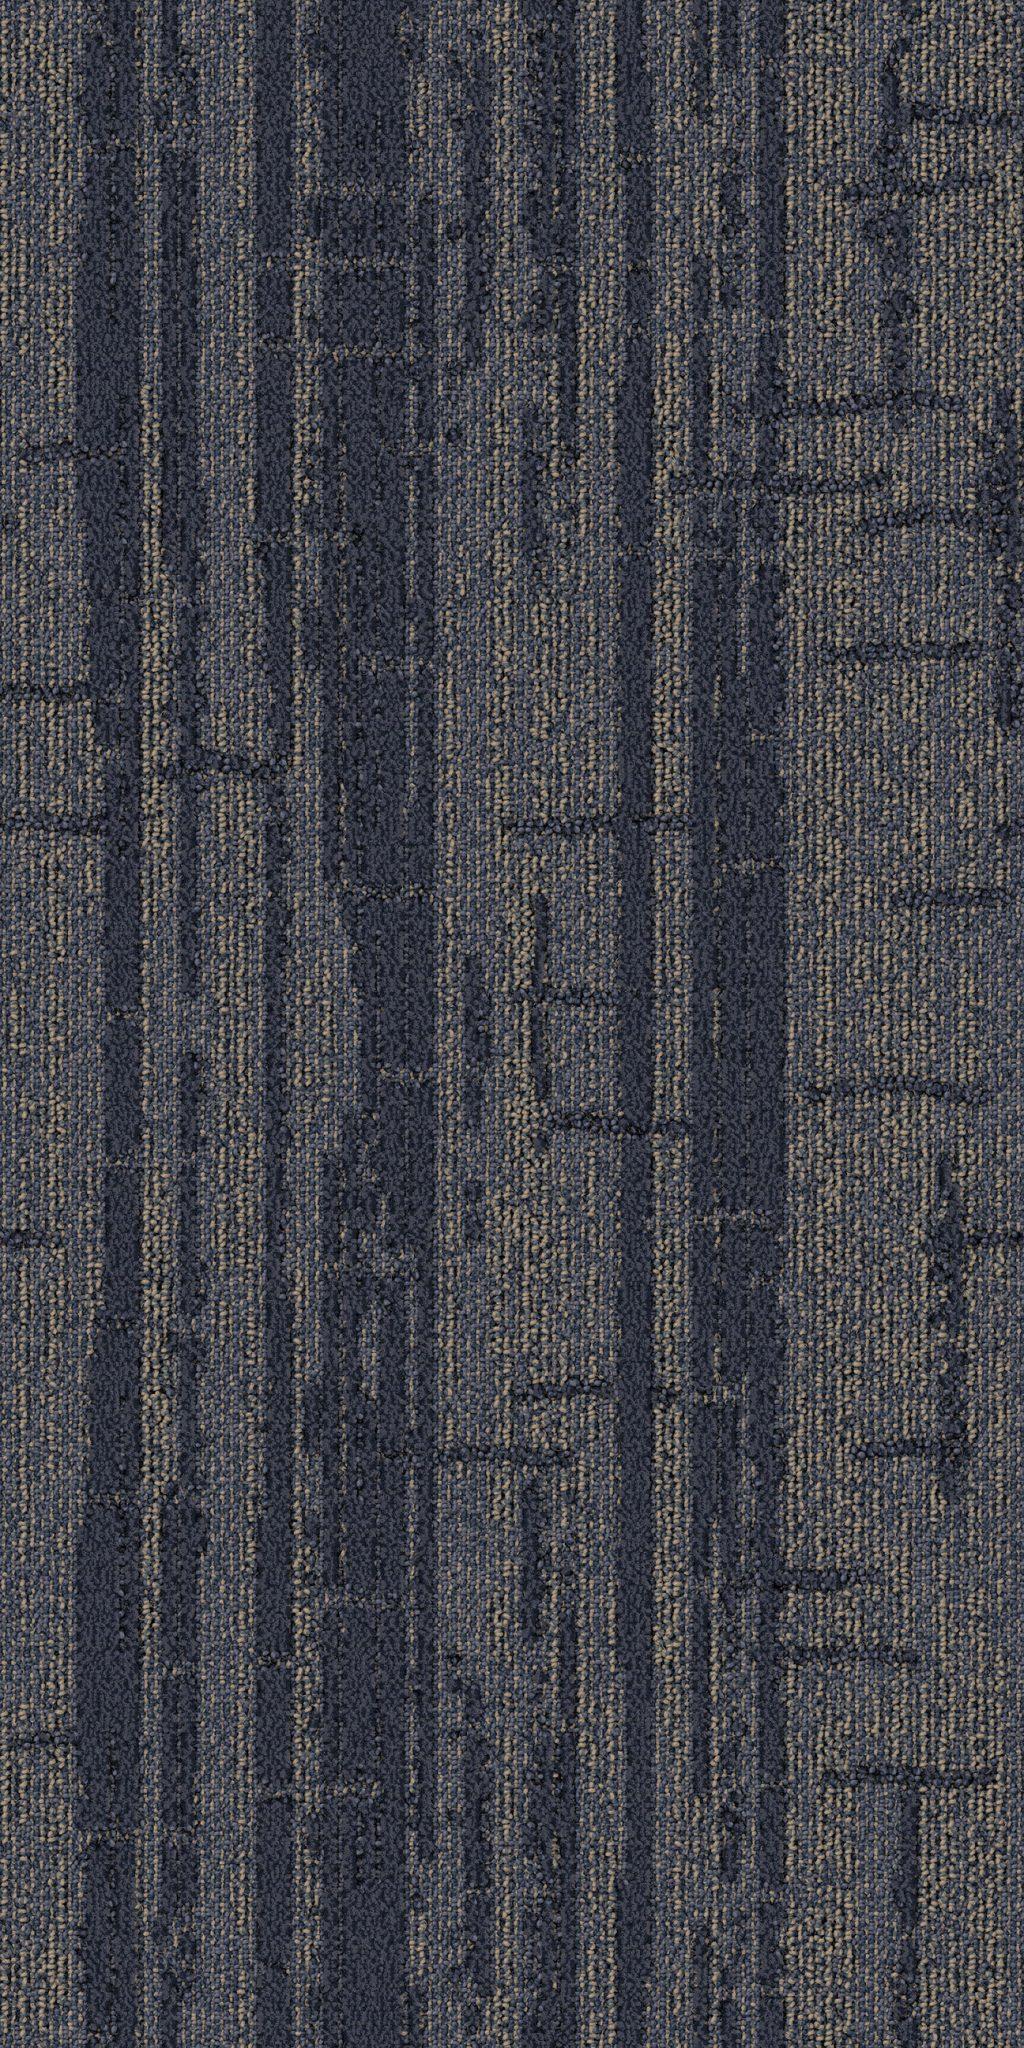 Moonlight Dalton Hospitality Carpet